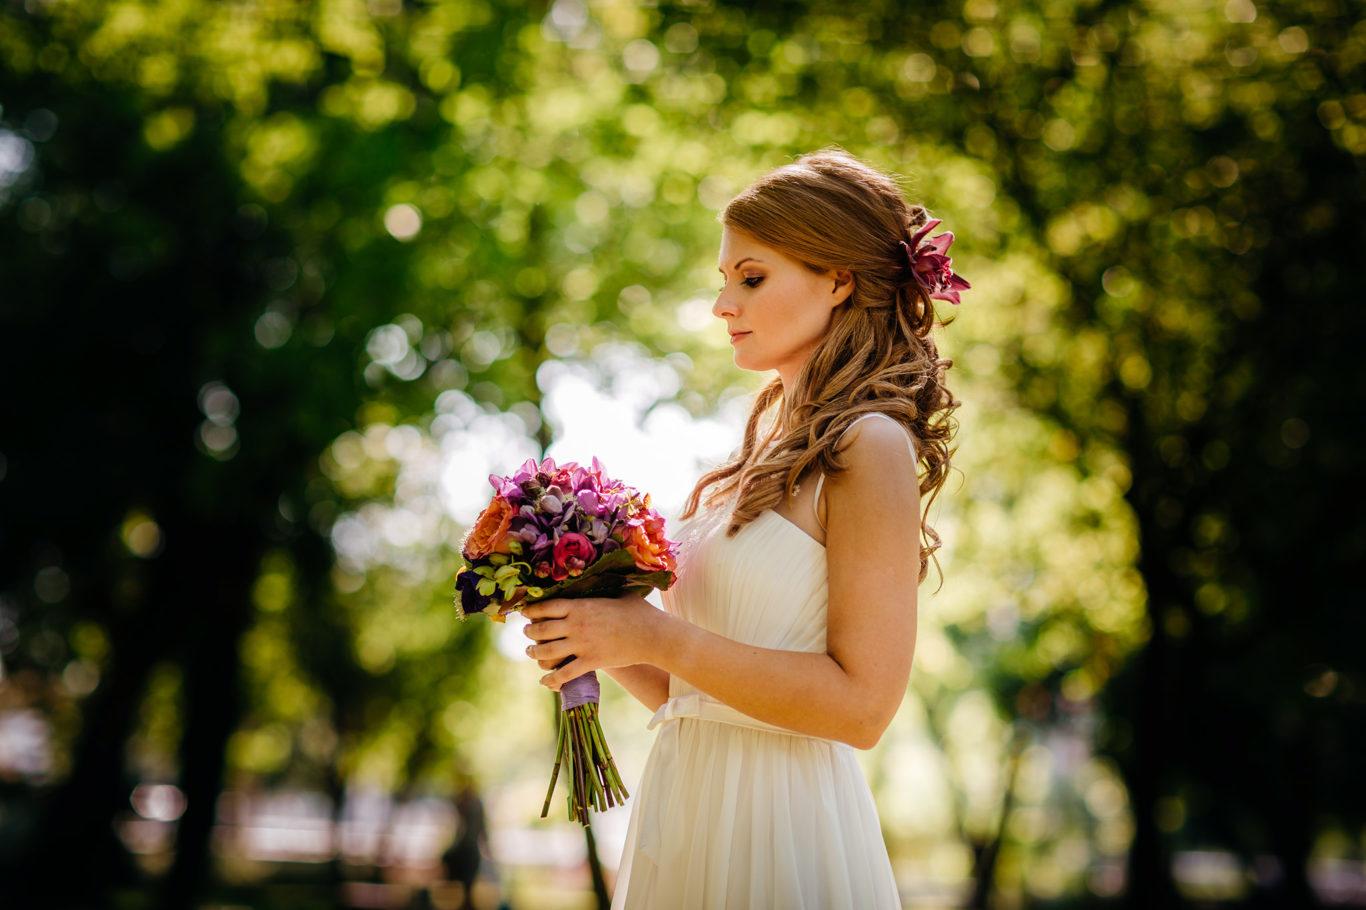 0240-fotografie-nunta-bucuresti-rodica-rares-fotograf-ciprian-dumitrescu-cd2_0177-3